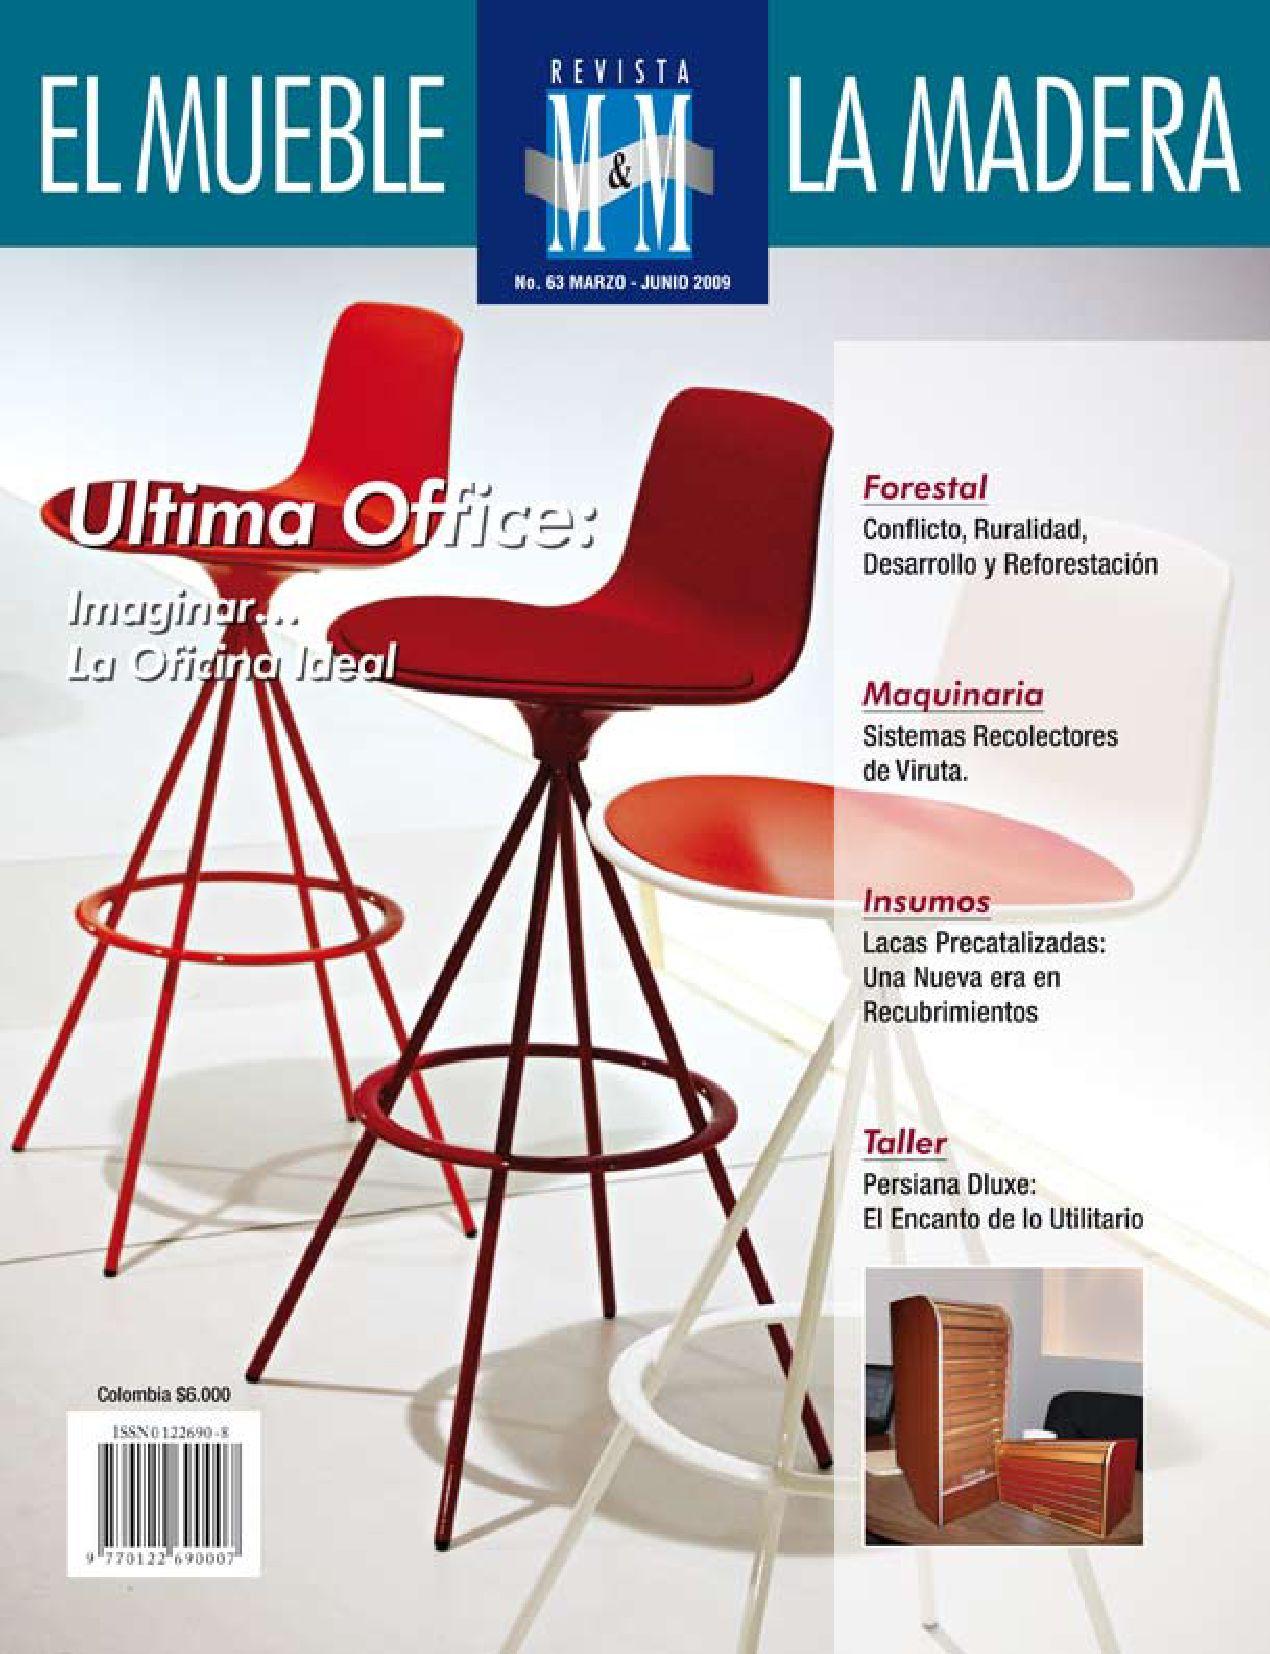 Revista m m no 63 by arbol de tinta issuu for Muebles gomez y sierra